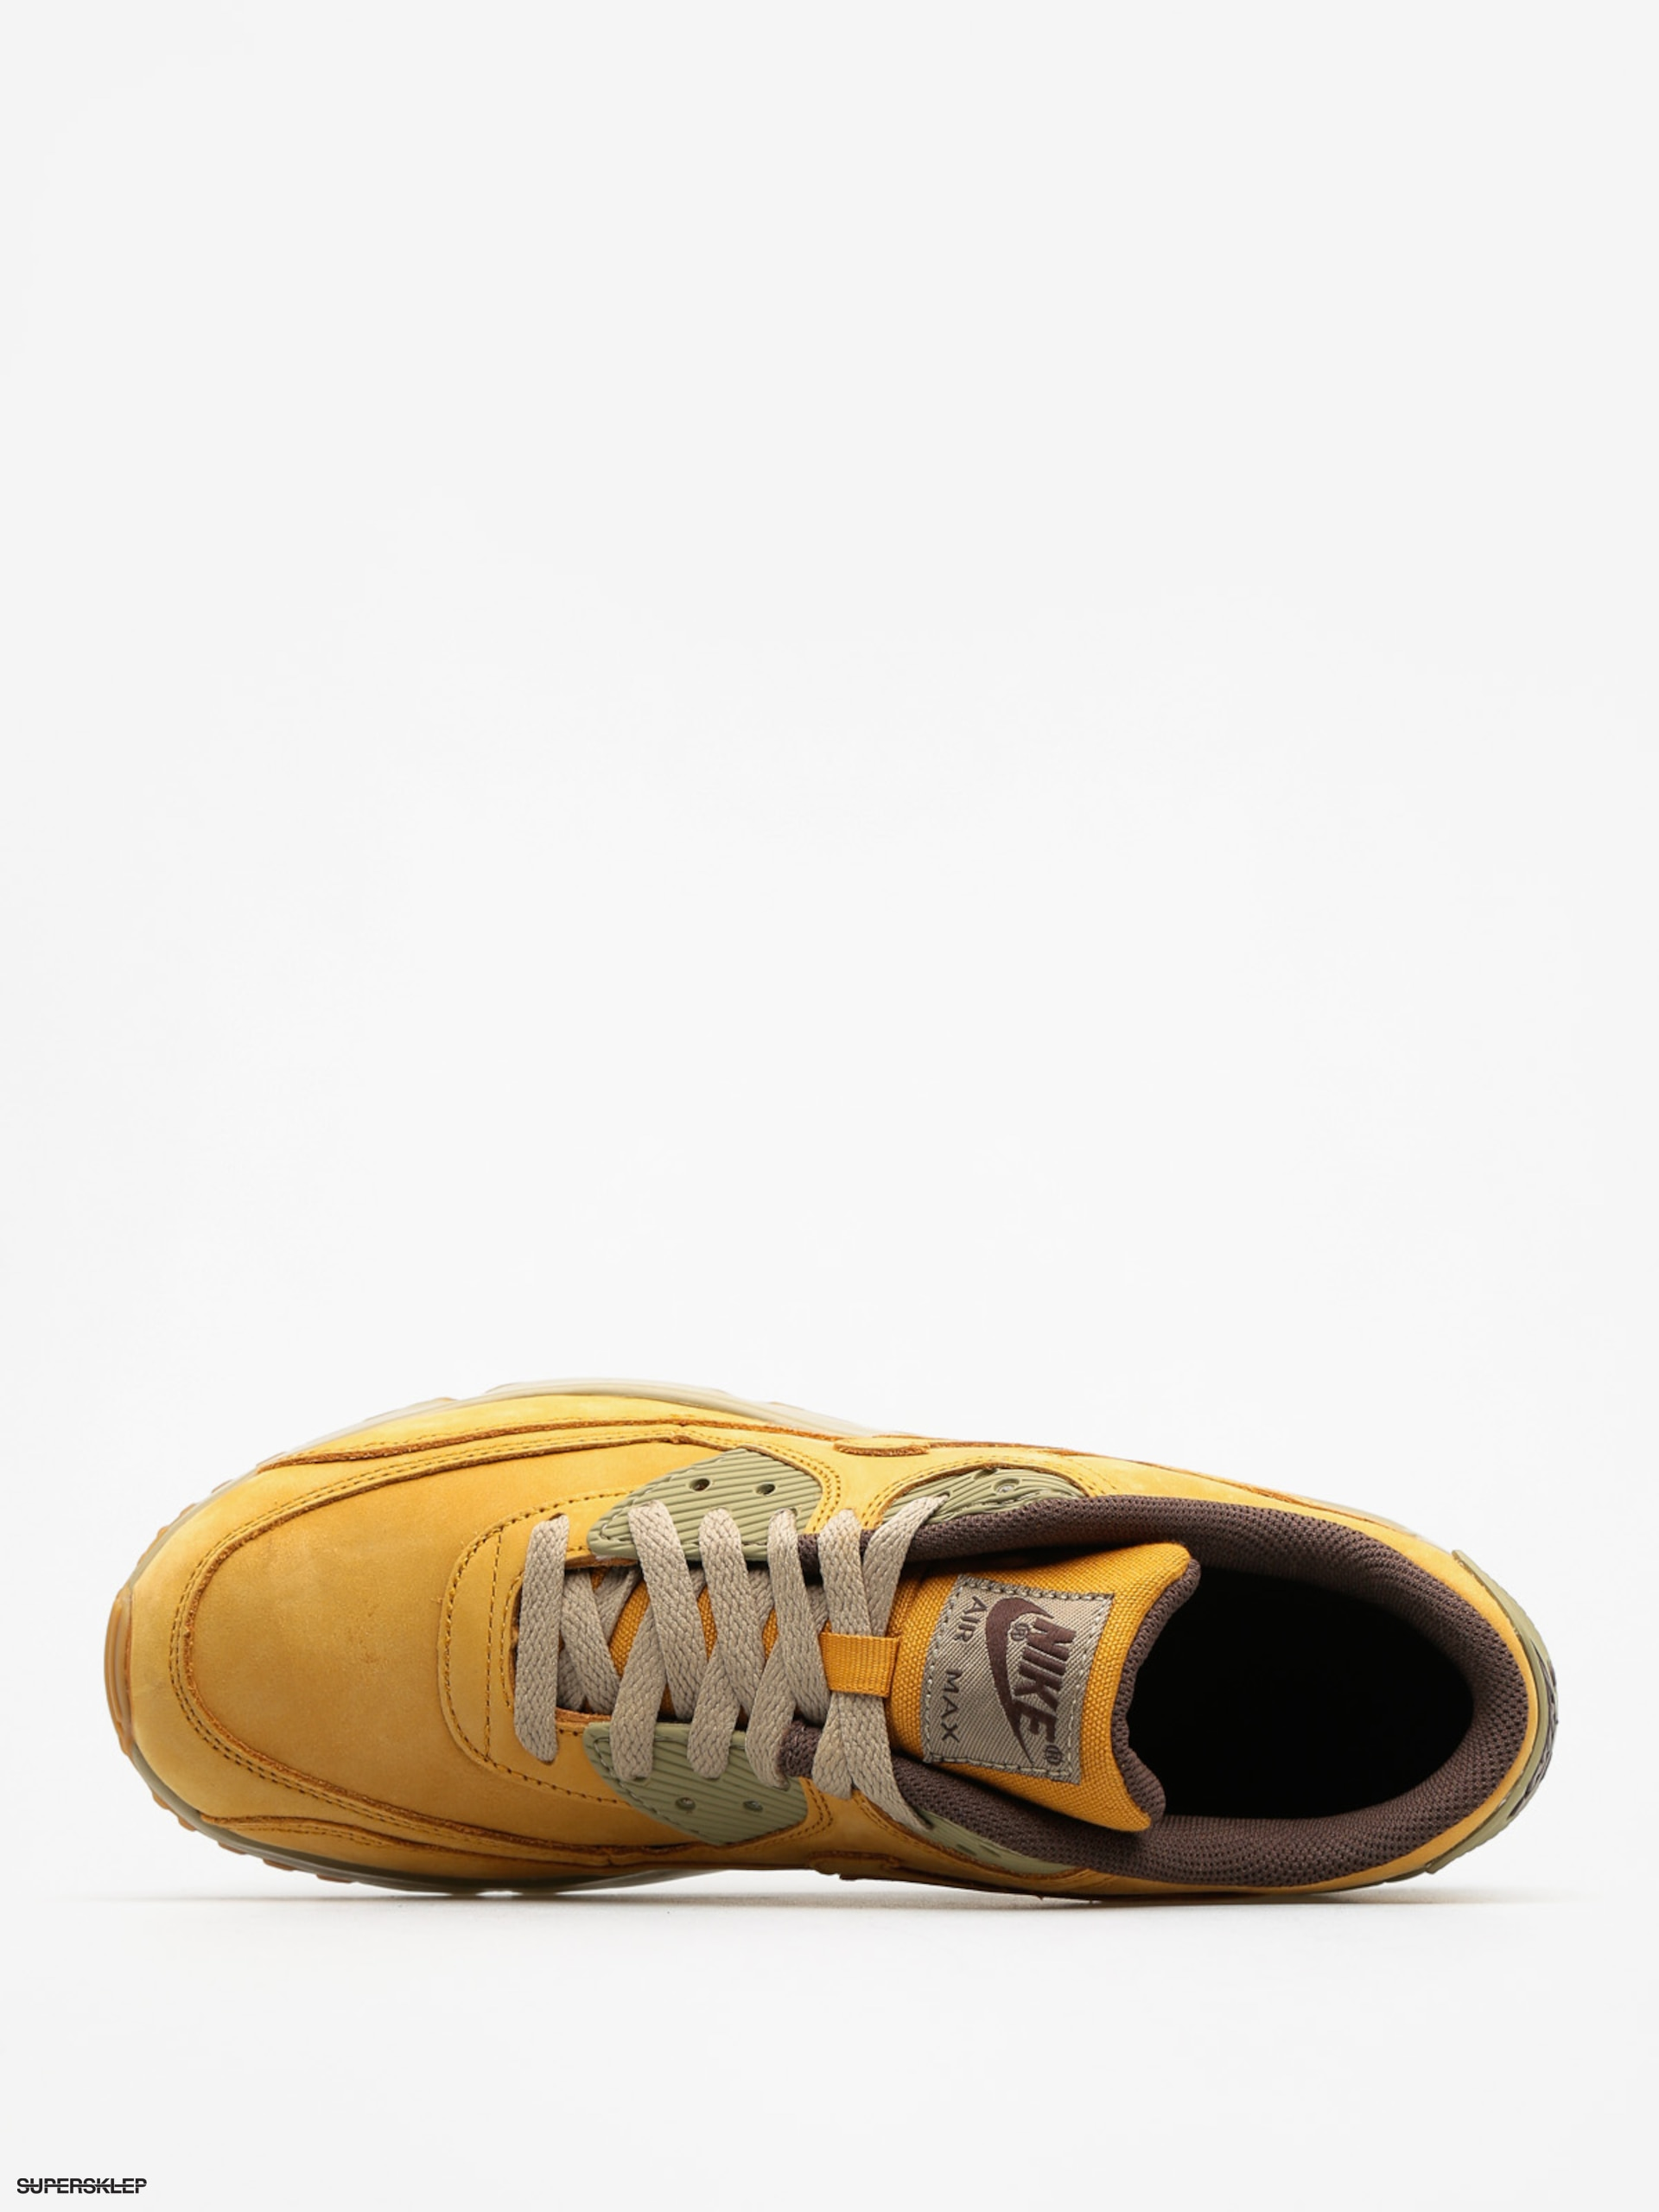 promo code ccb25 40aca Boty Nike Air Max 90 Winter Premium Gs (bronze bronze baroque brown bamboo)